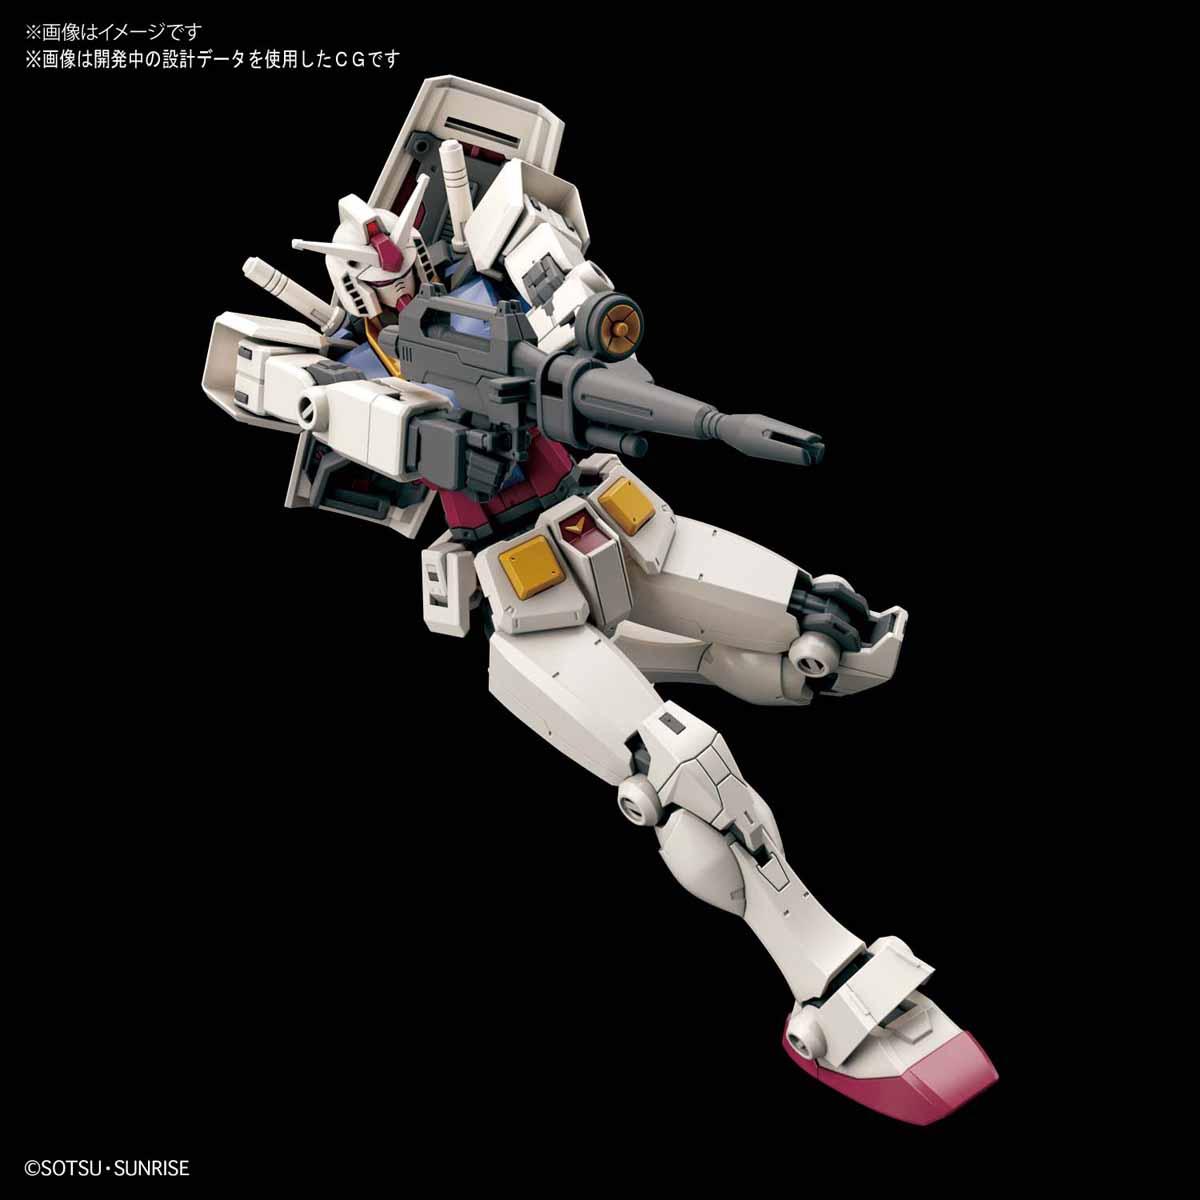 HG 1/144 RX-78-02 鋼彈 [BEYOND GLOBAL]